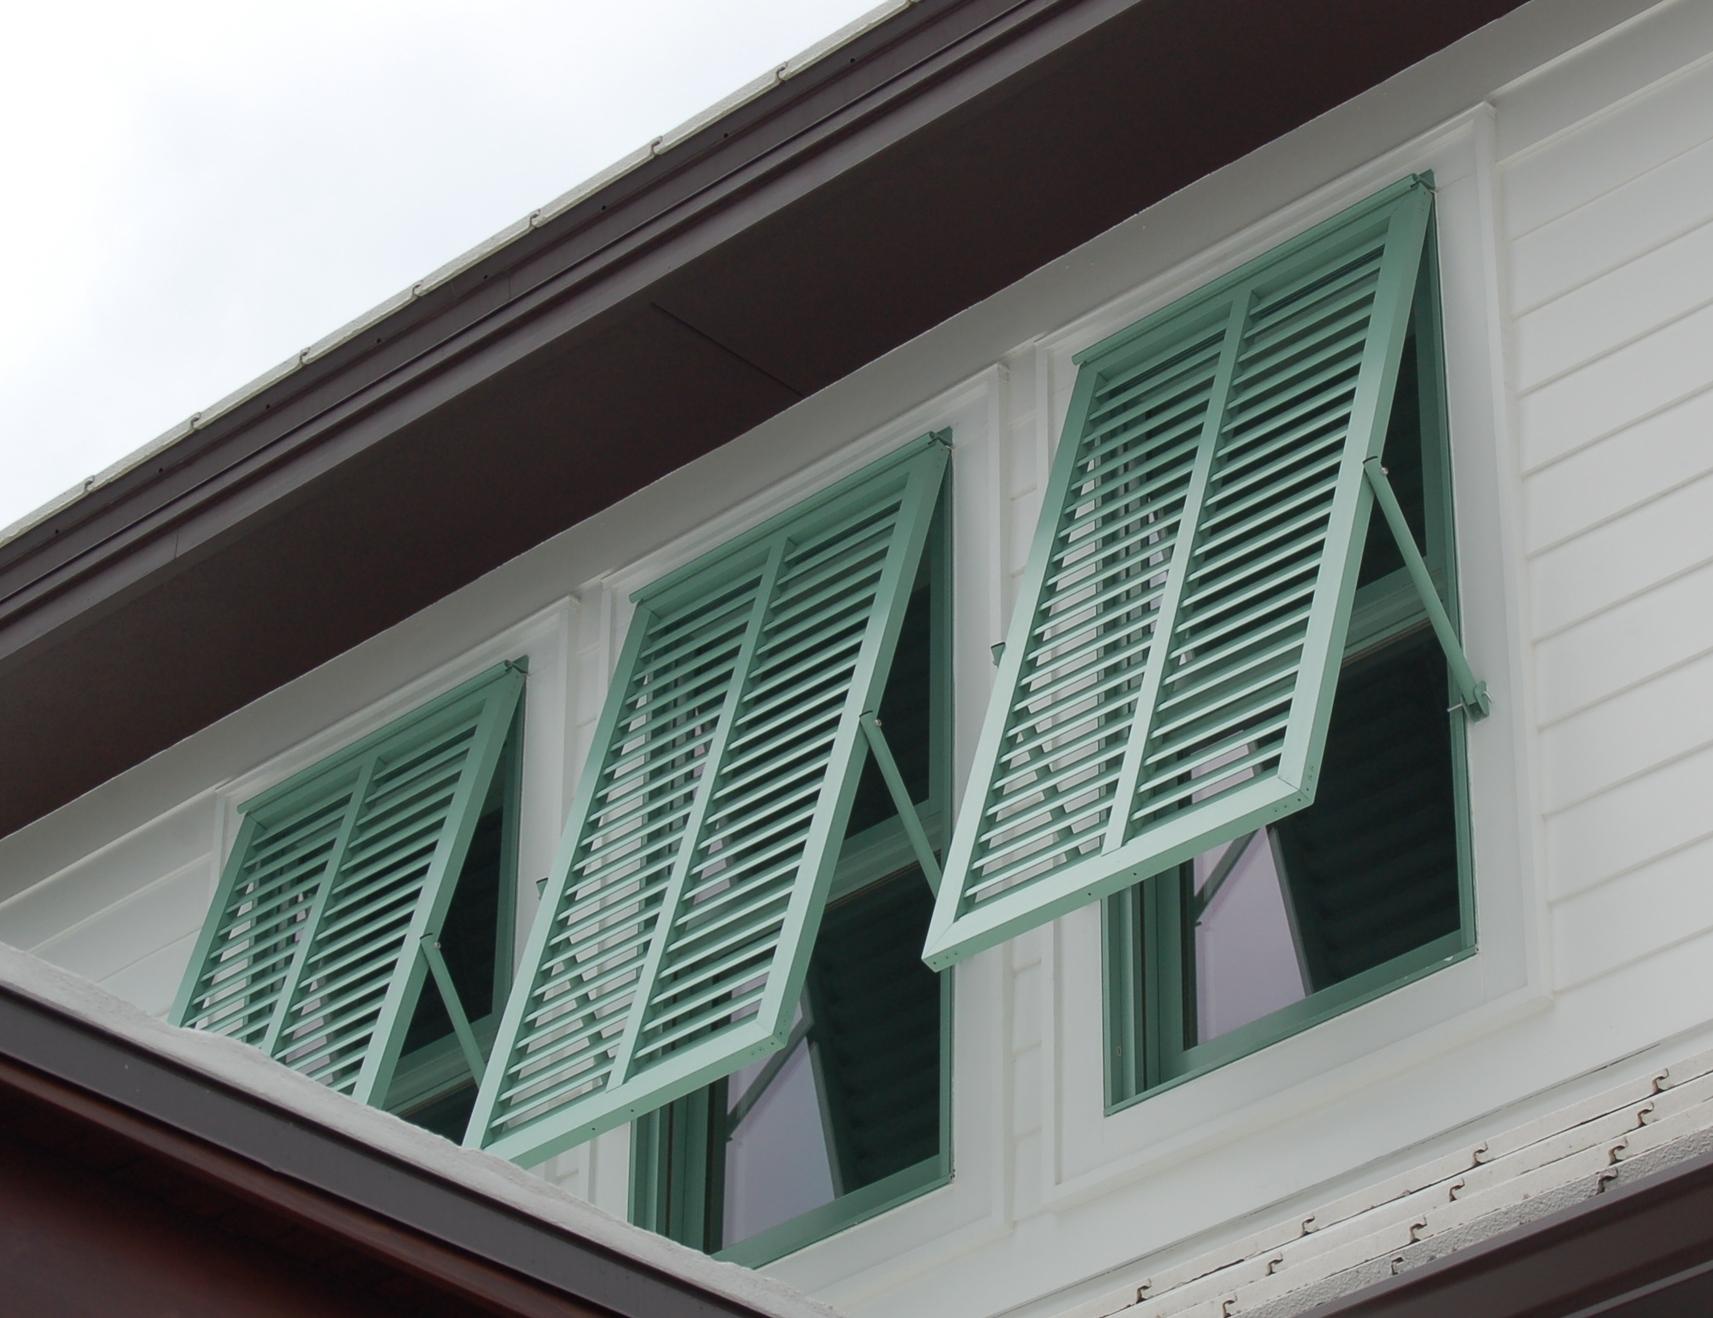 74 Murray Homes Decorative Bahama Shutters